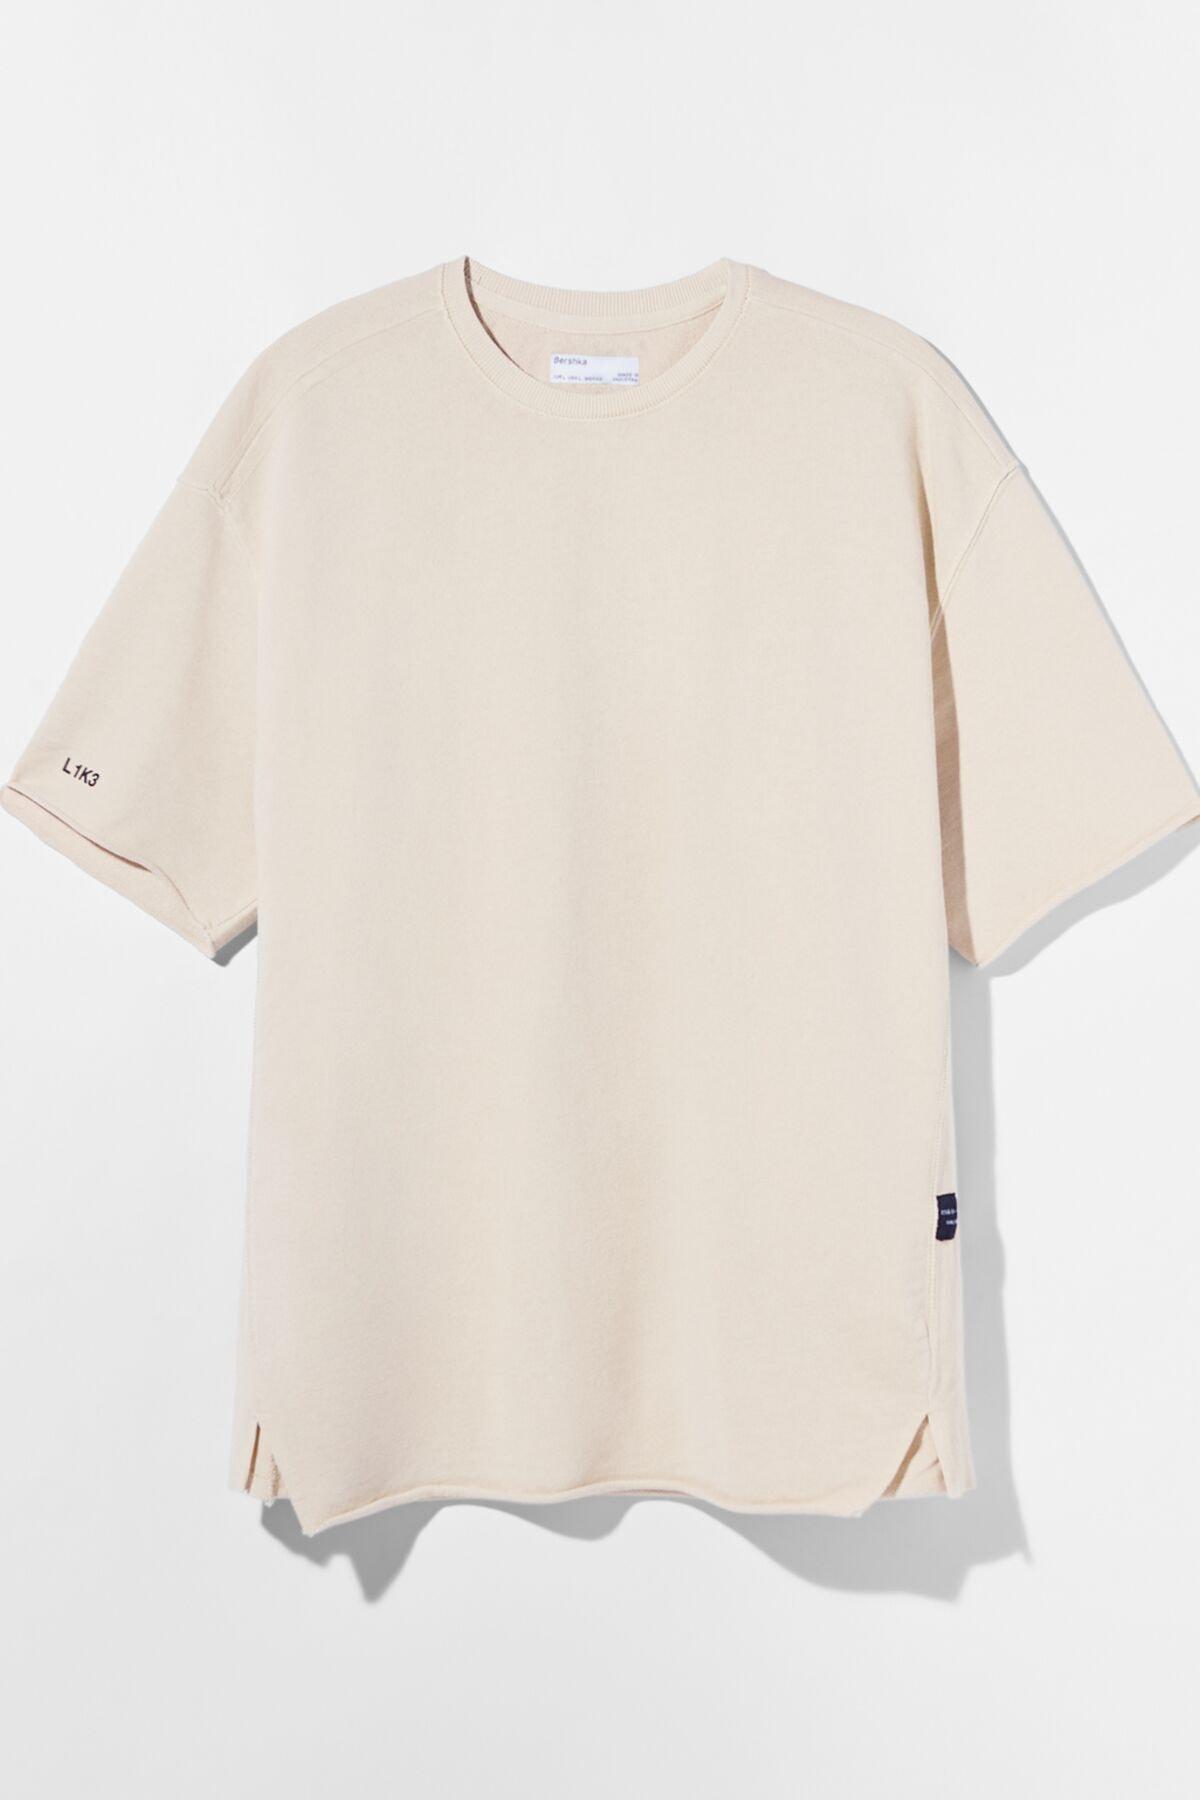 Bershka Erkek Kum Rengi Soluk Efektli Pamuklu T-Shirt 02406240 4